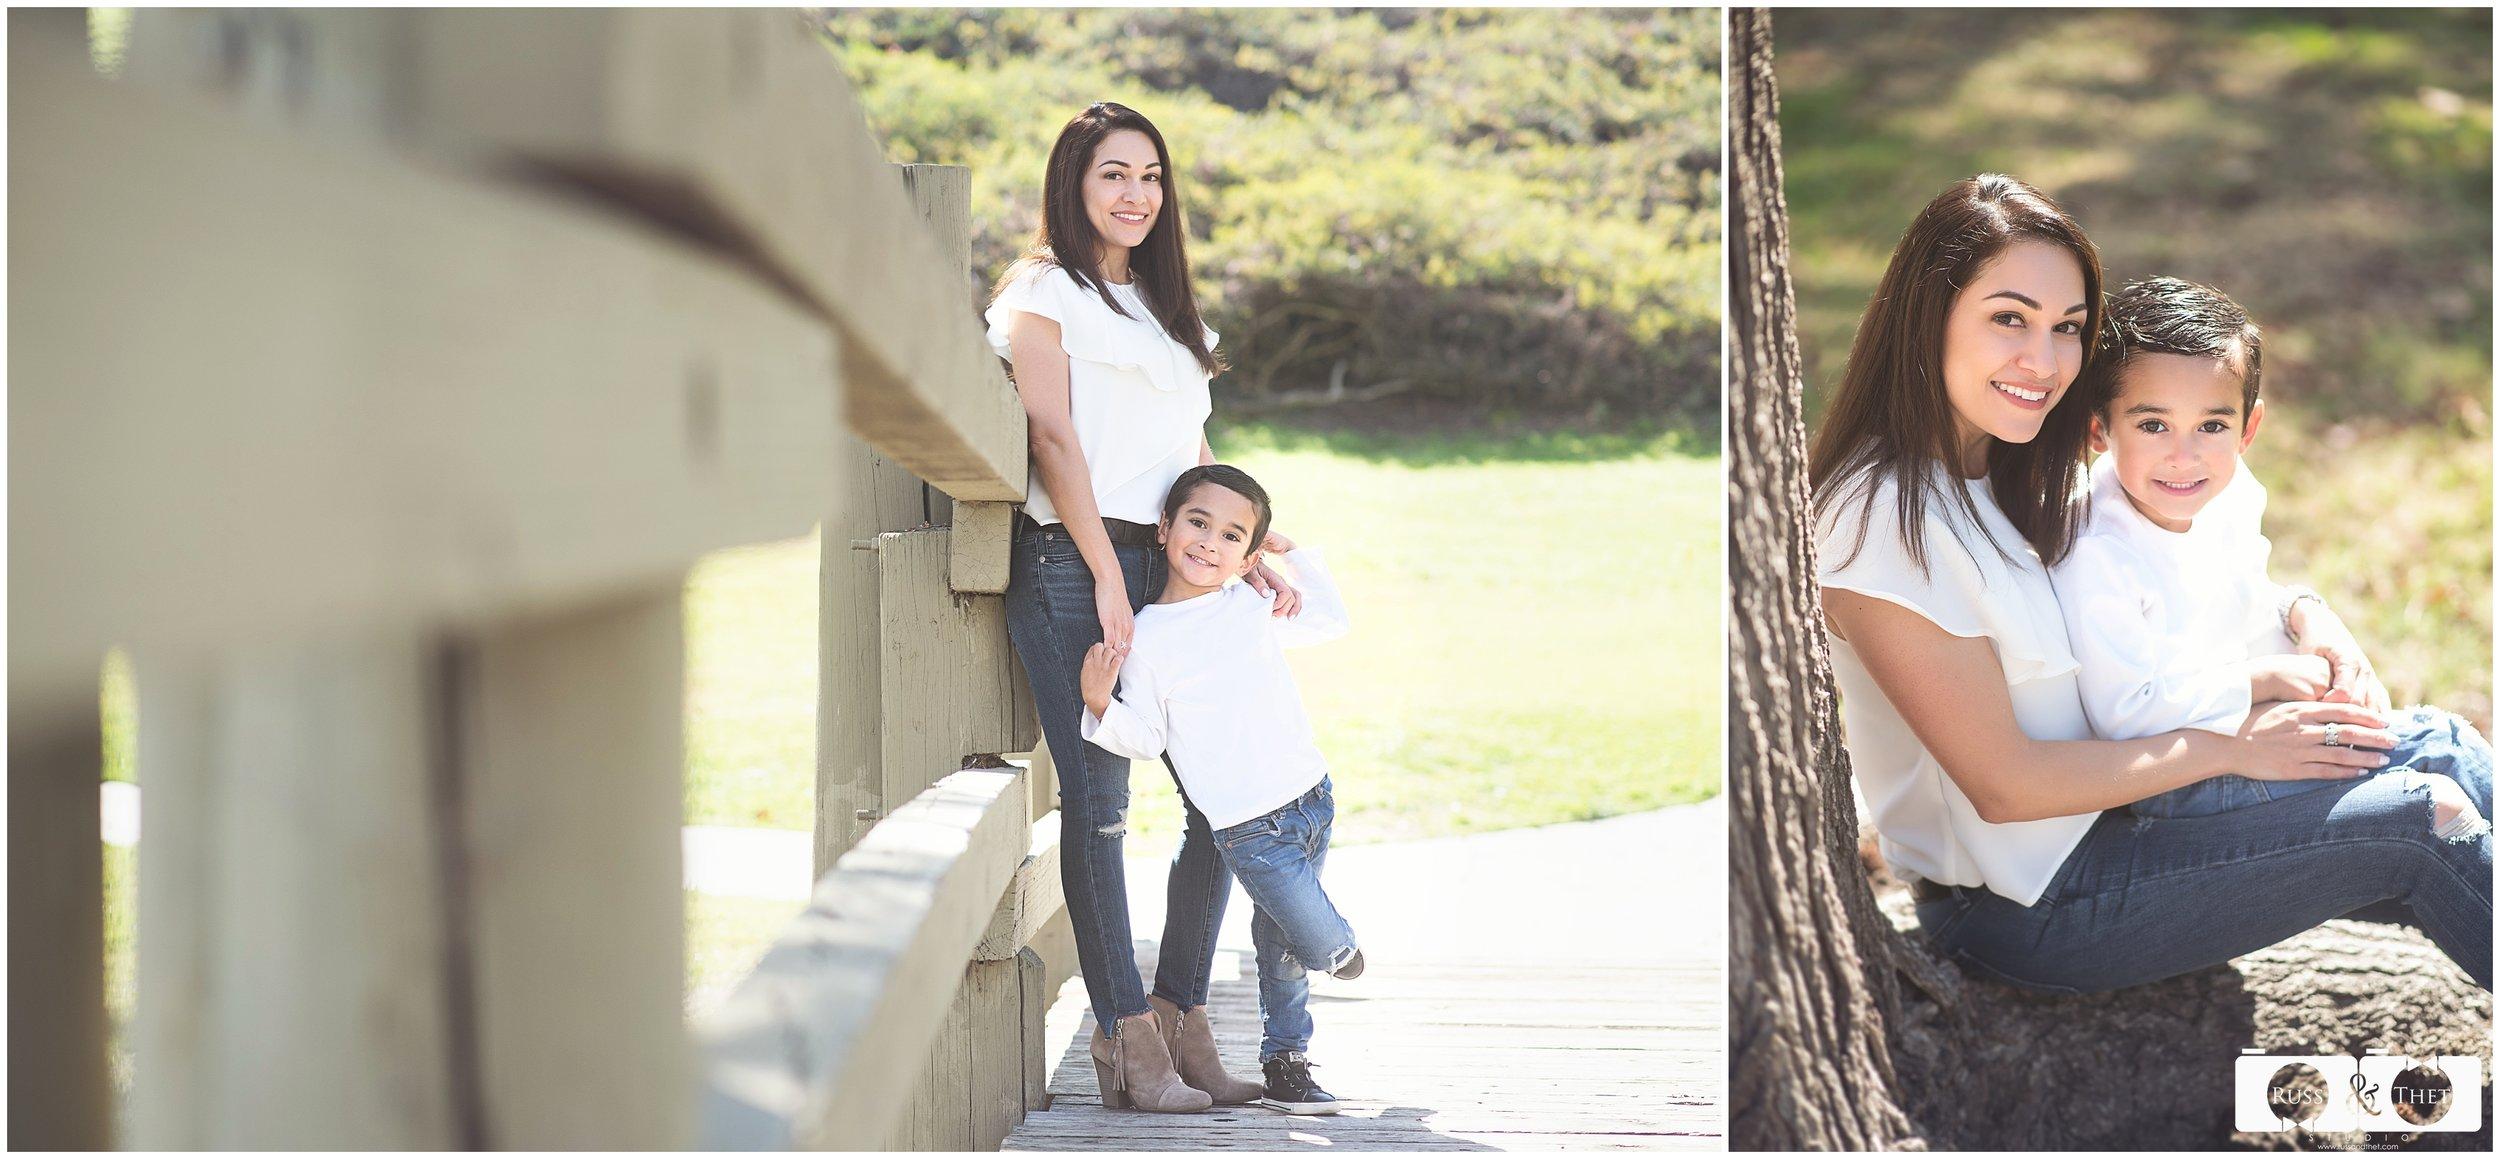 La-Mirada-Creek-Park-Family-Maternity-Kids-Portraits (12).jpg